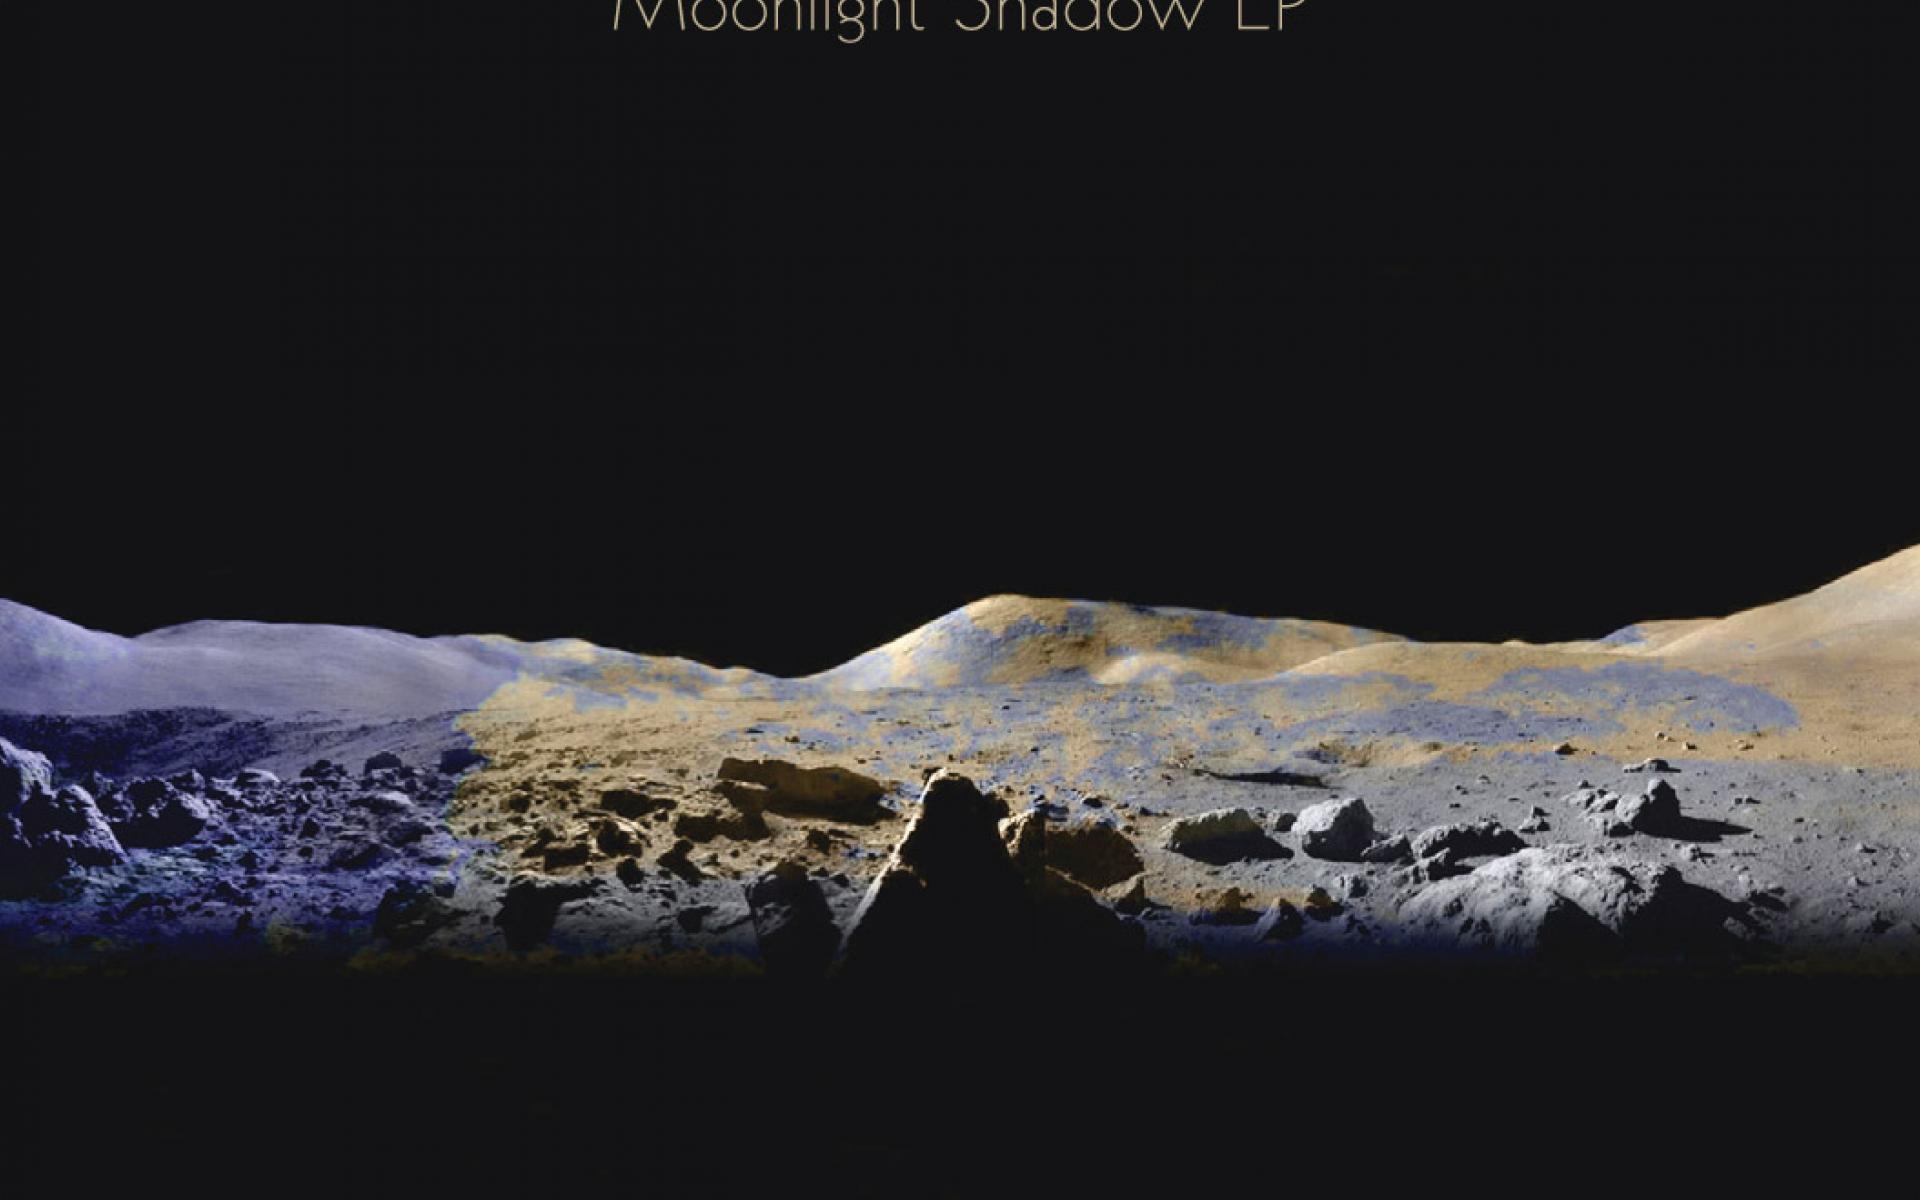 Seidensticker & Salour – Moonlight Shadow EP